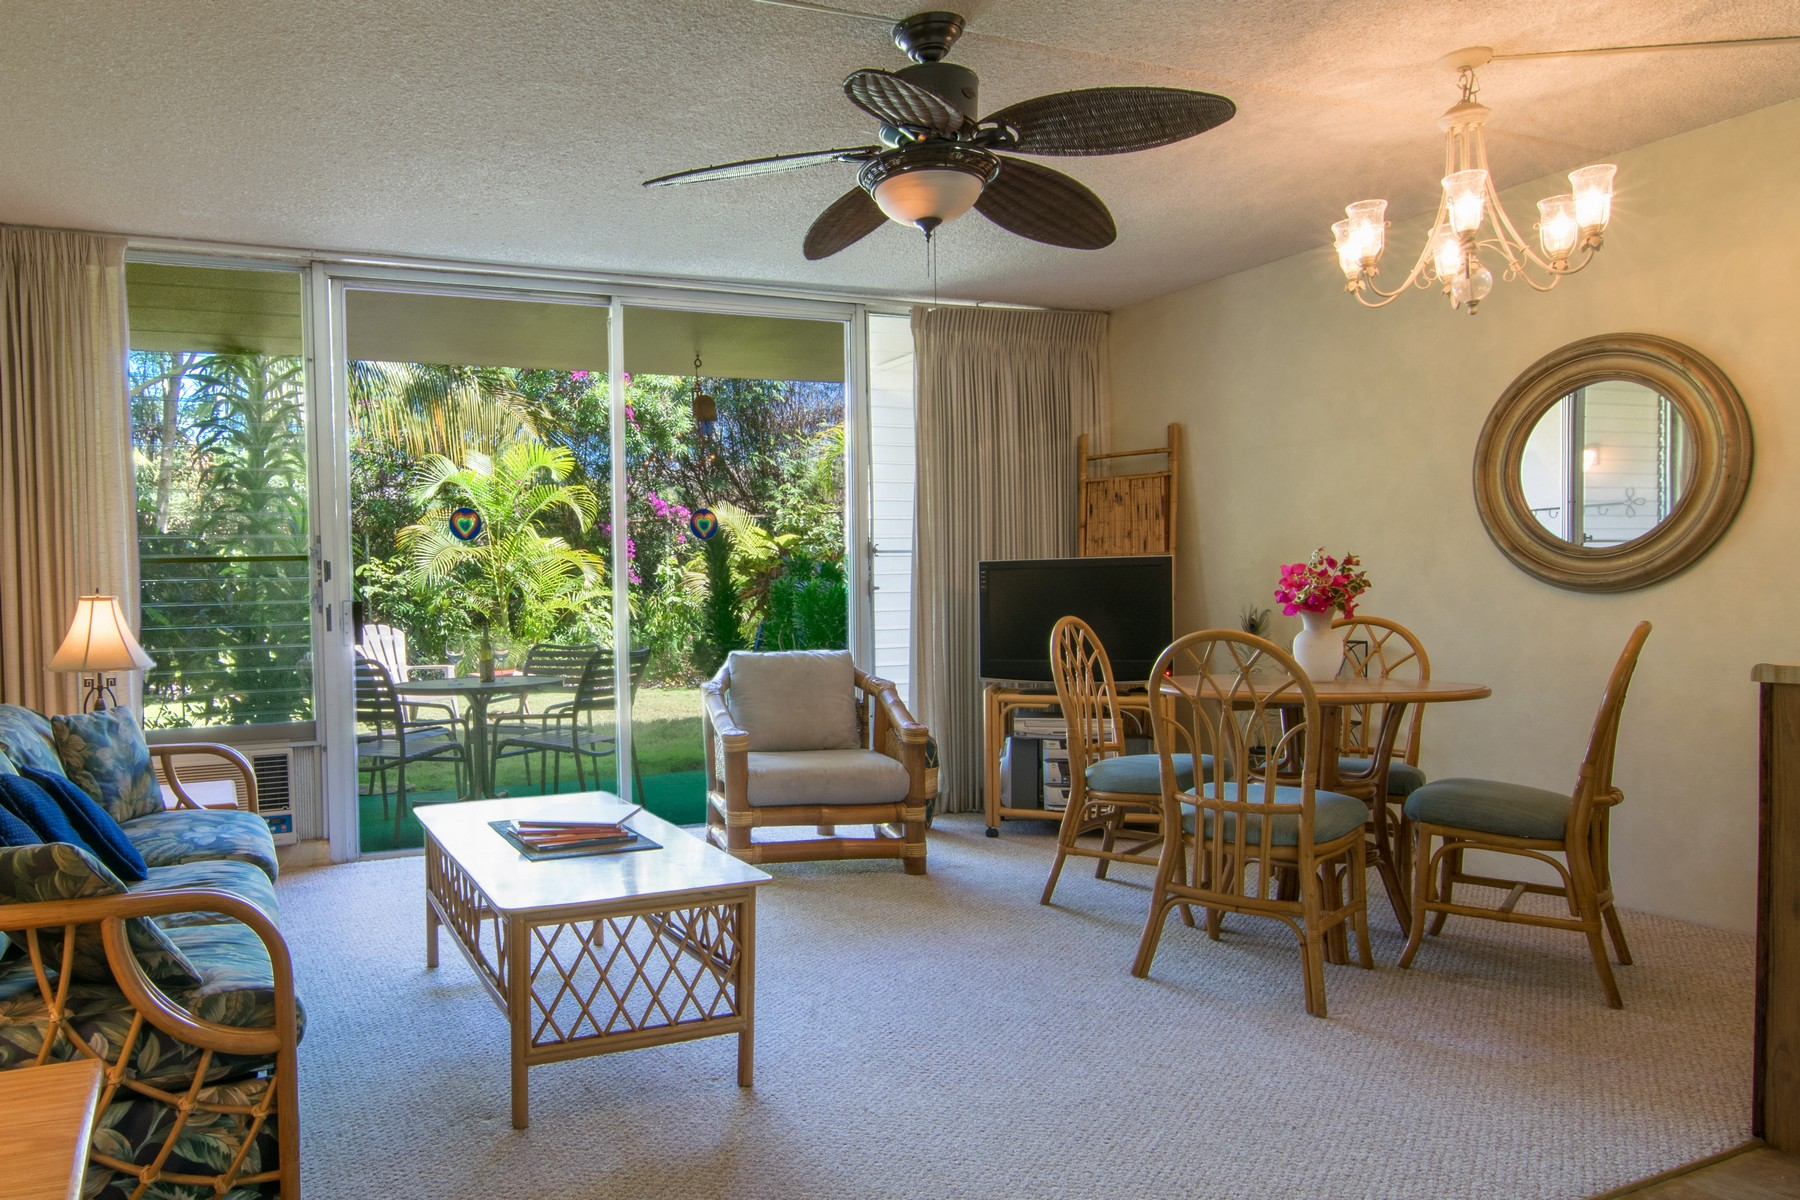 Condominium for Sale at Location Location Location - Maui Vacation Condo 2495 South Kihei Road, Kihei Kai Nani 155 Kihei, Hawaii 96753 United States